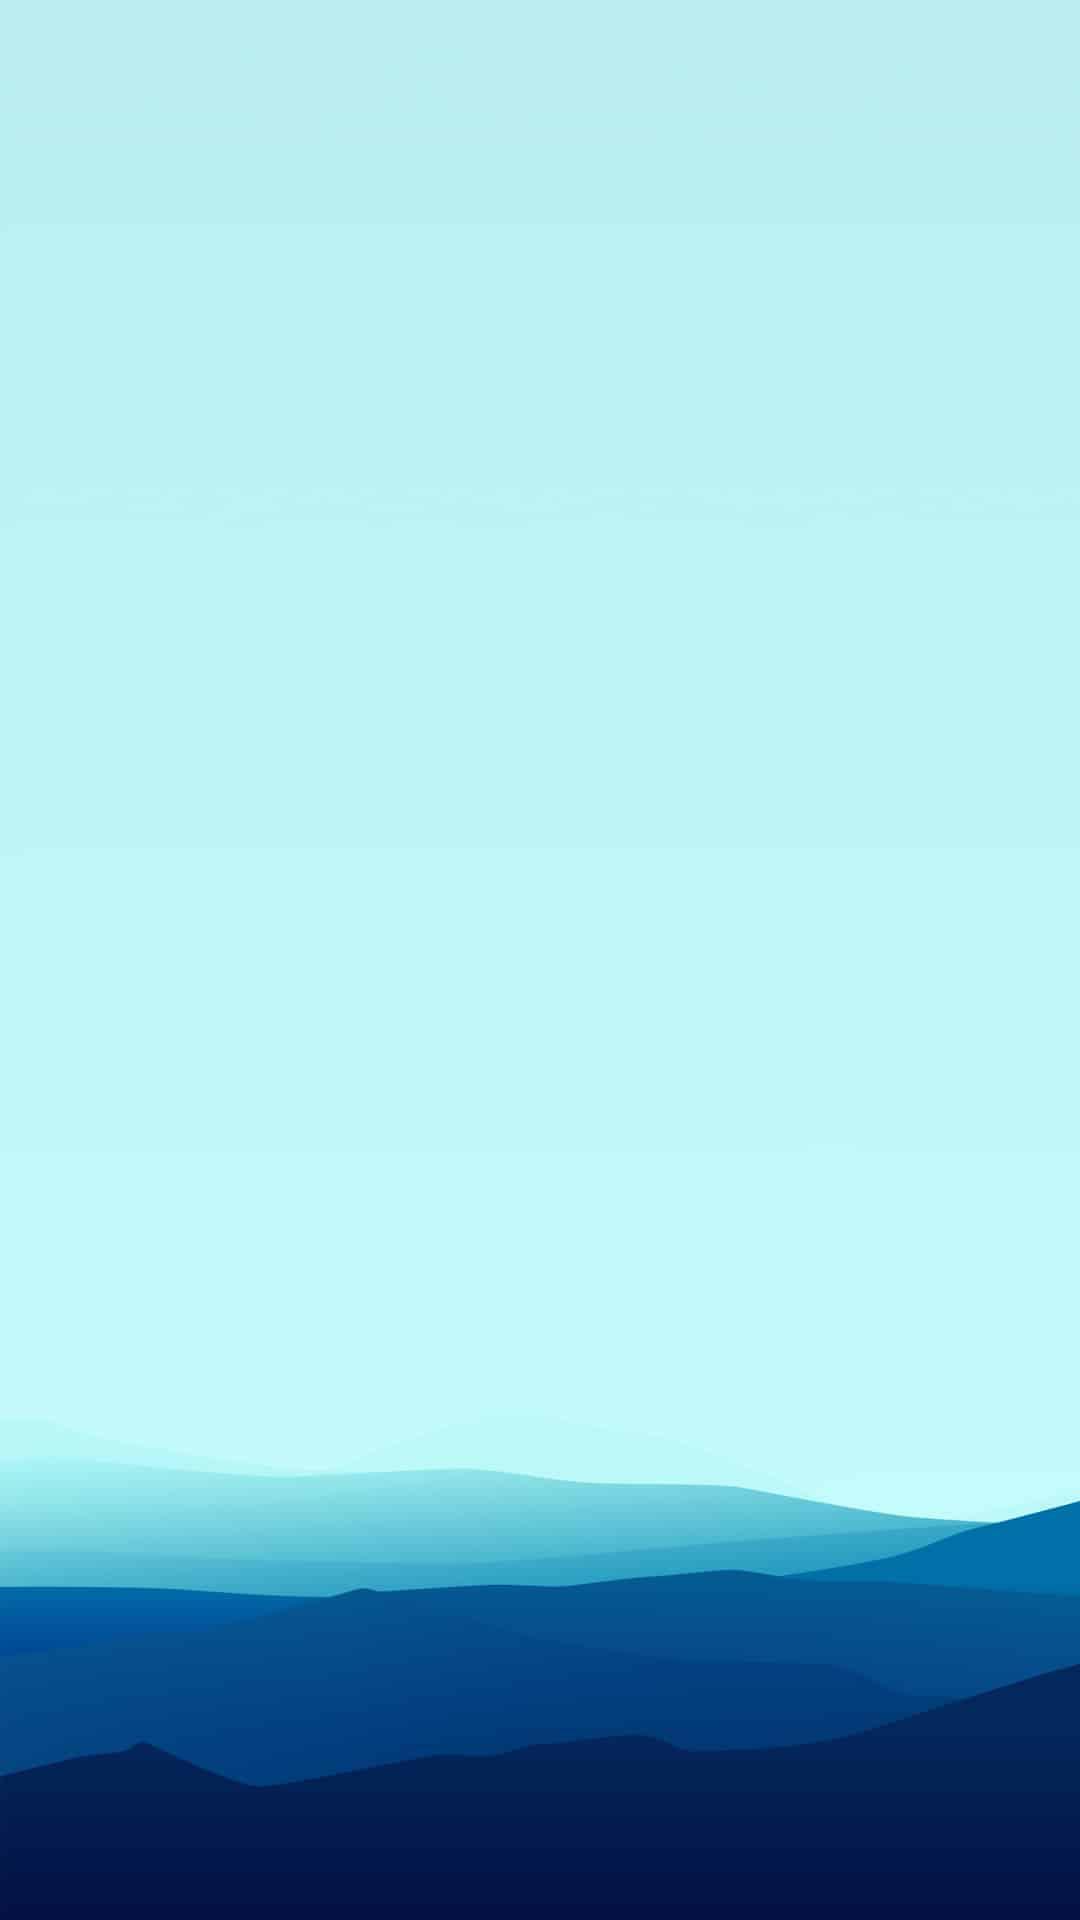 Minimalist iPhone HD Wallpapers - Wallpaper Cave